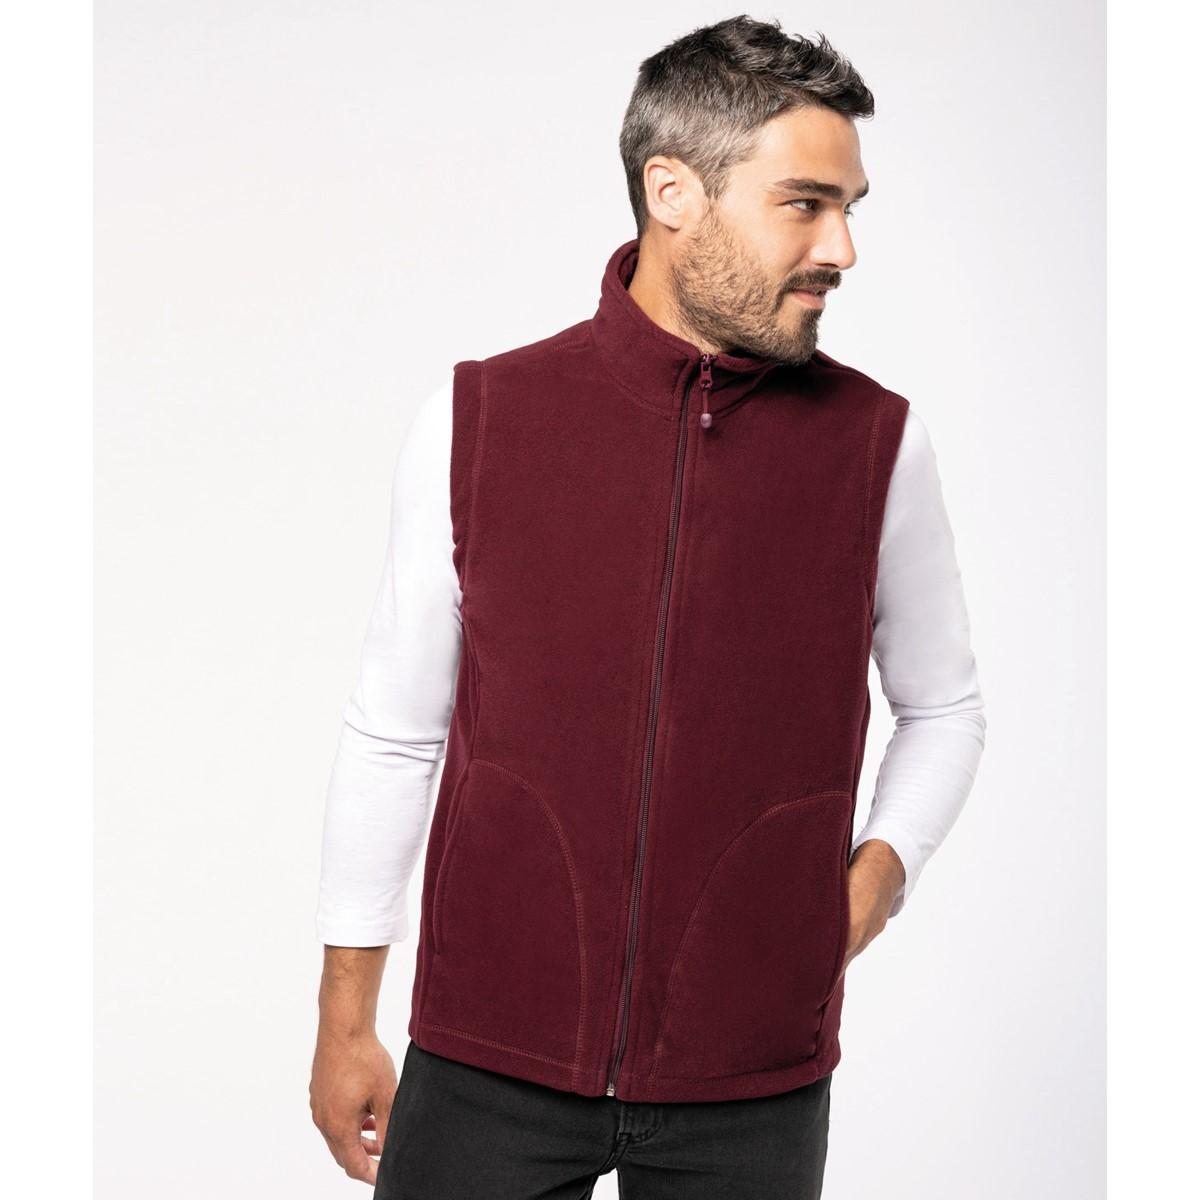 Kariban Mens Luca Gilet Bodywarmer Fleece Jackets